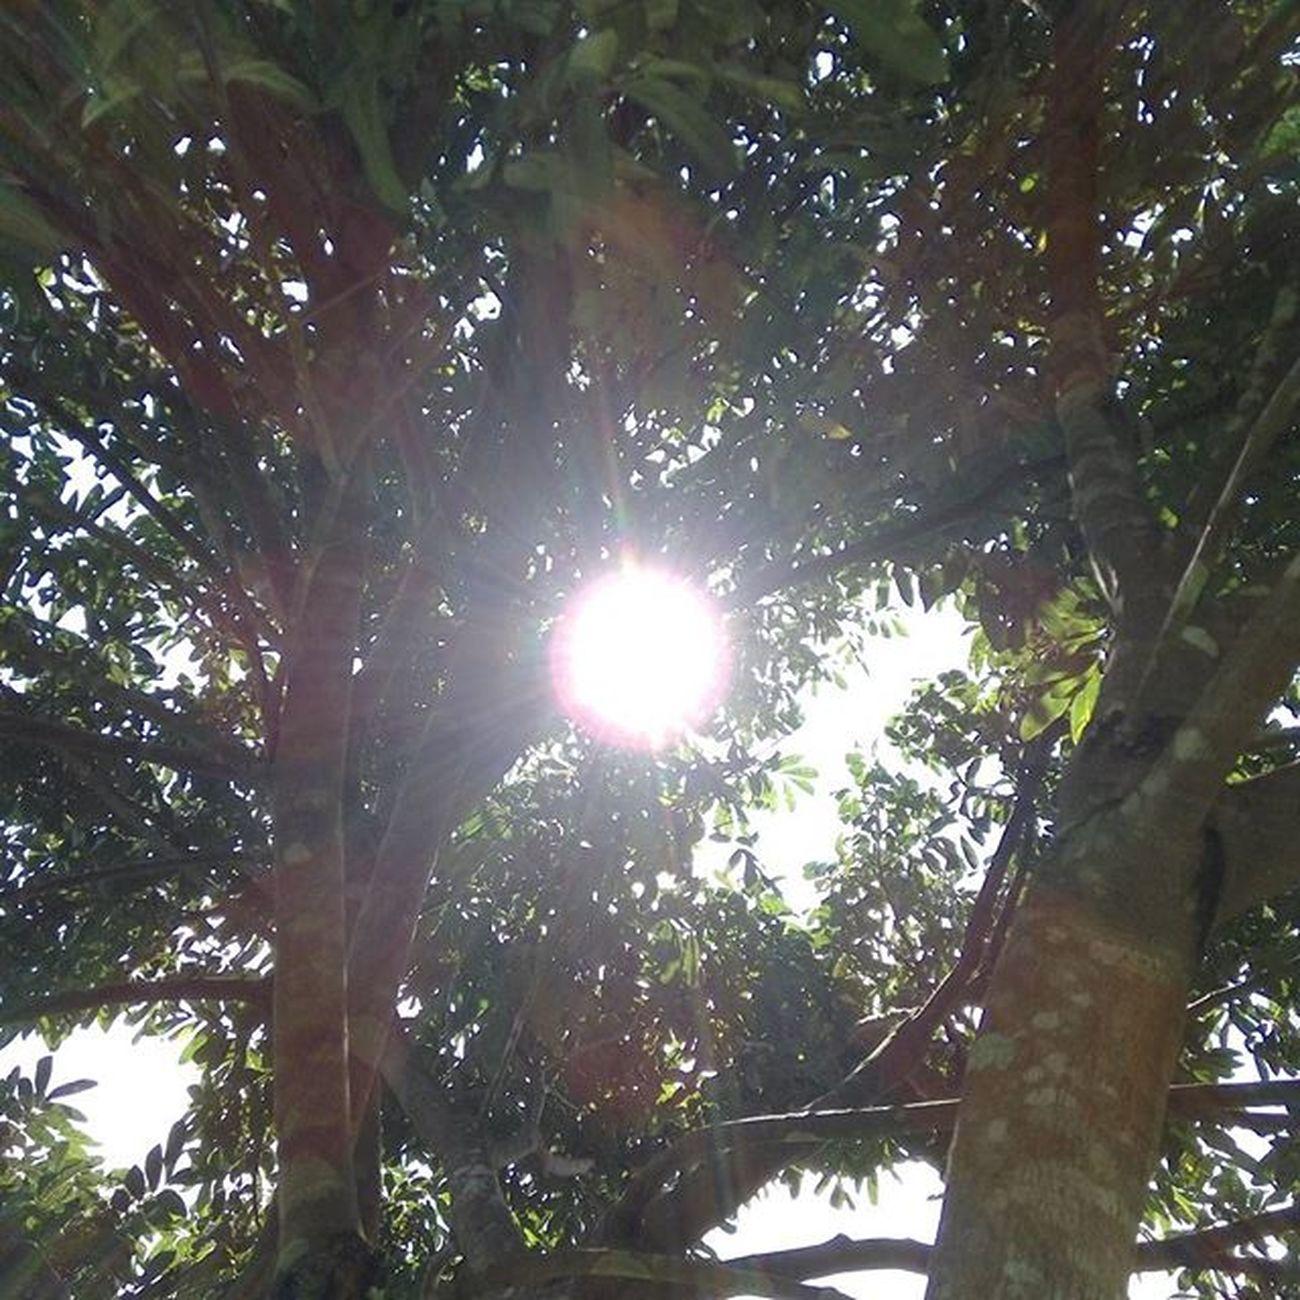 Menembus rimbunnya daun... Bright Sun Light Daylight Hot Tree Life Instagram Noedit Original Naturalcolor